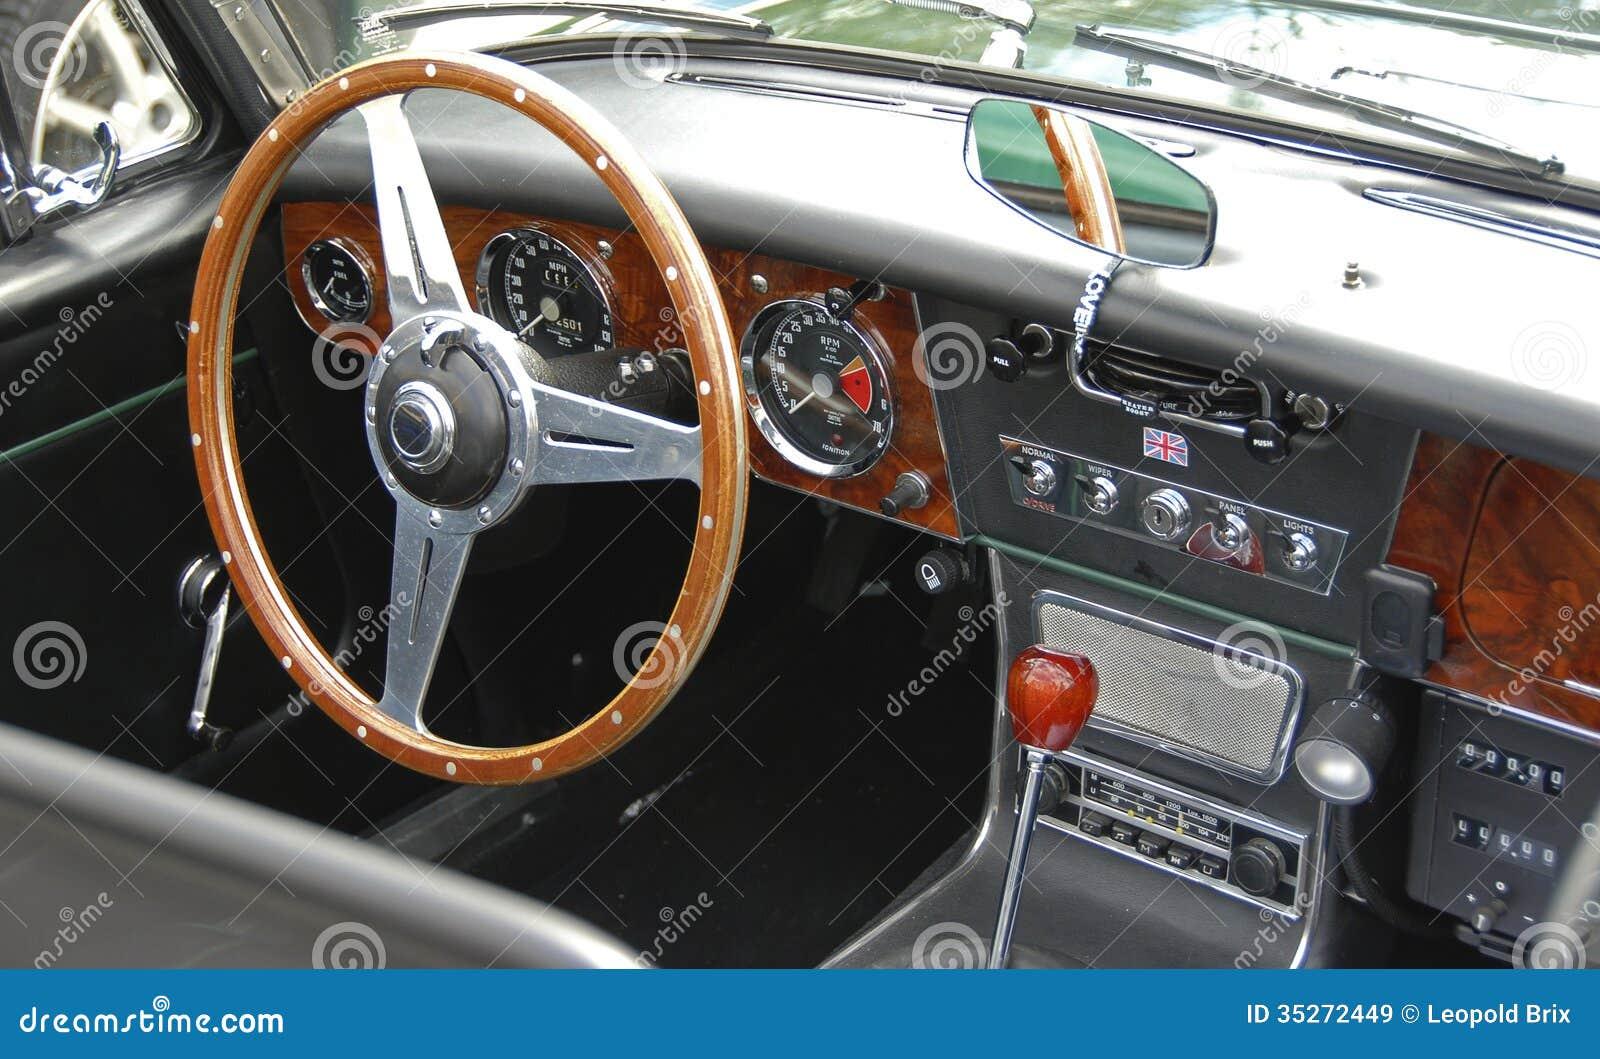 Car styling dashboard decorative light strip cover frame